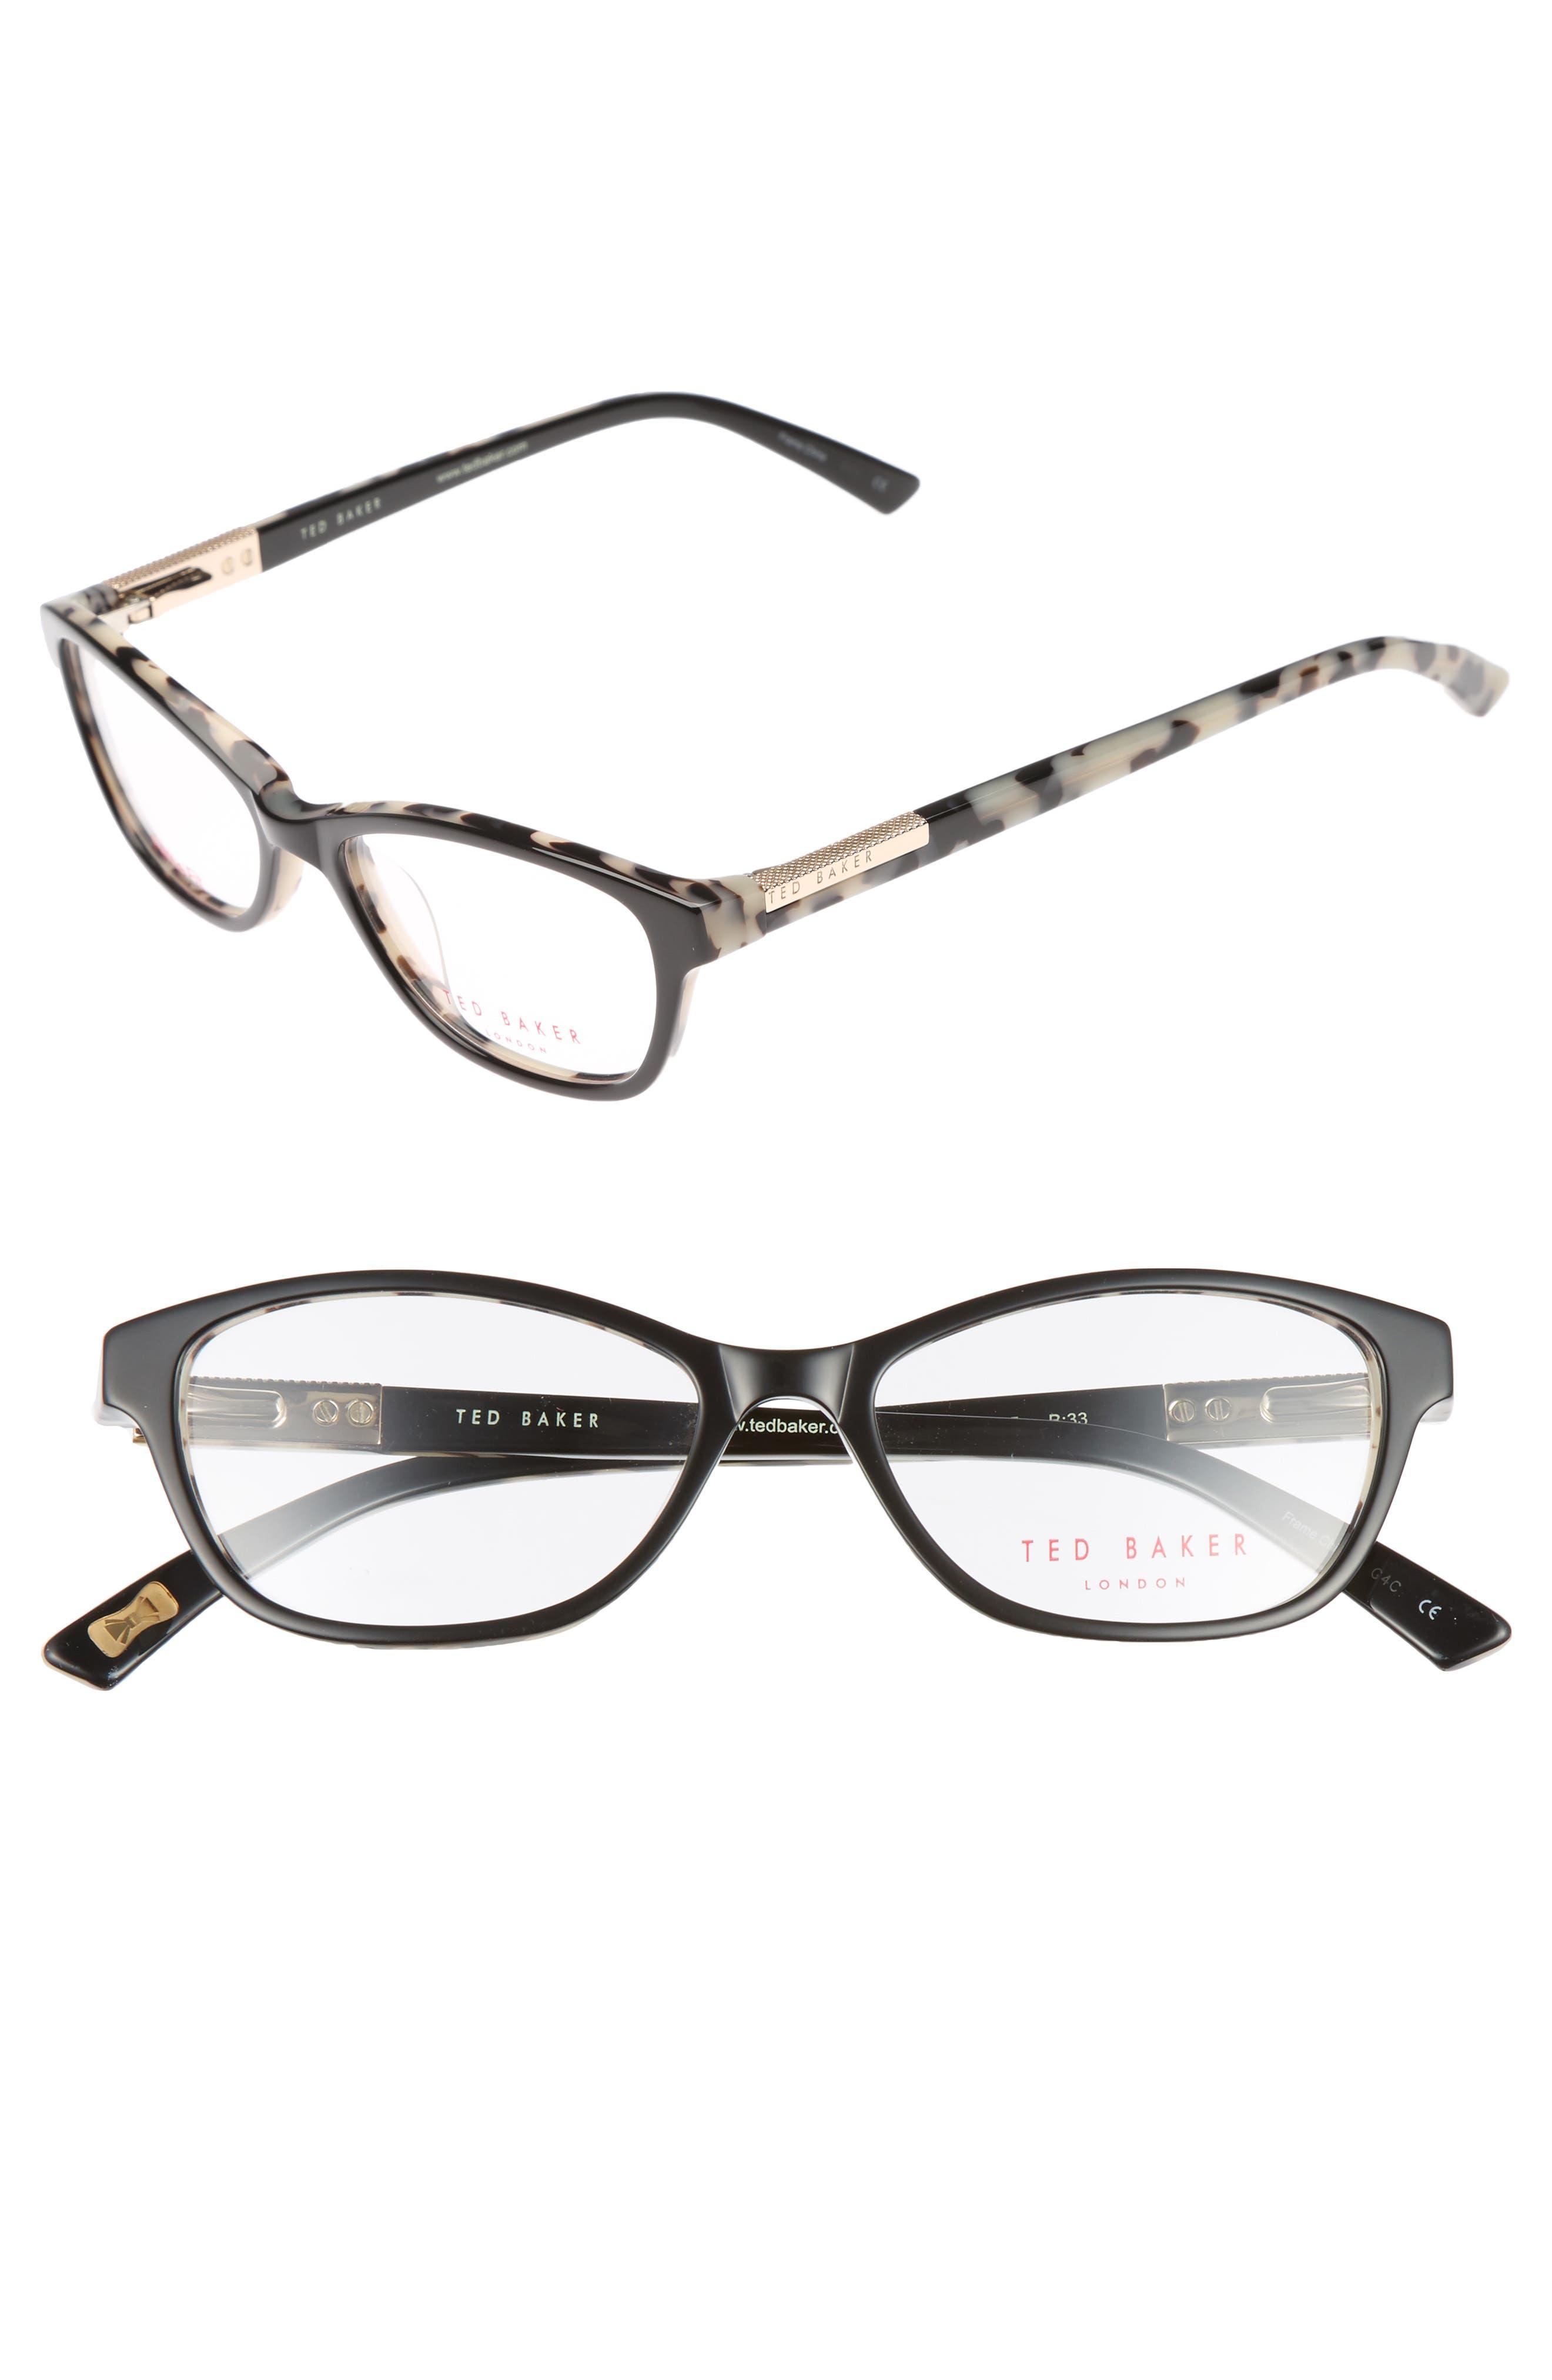 50mm Optical Cat Eye Glasses,                             Main thumbnail 1, color,                             001